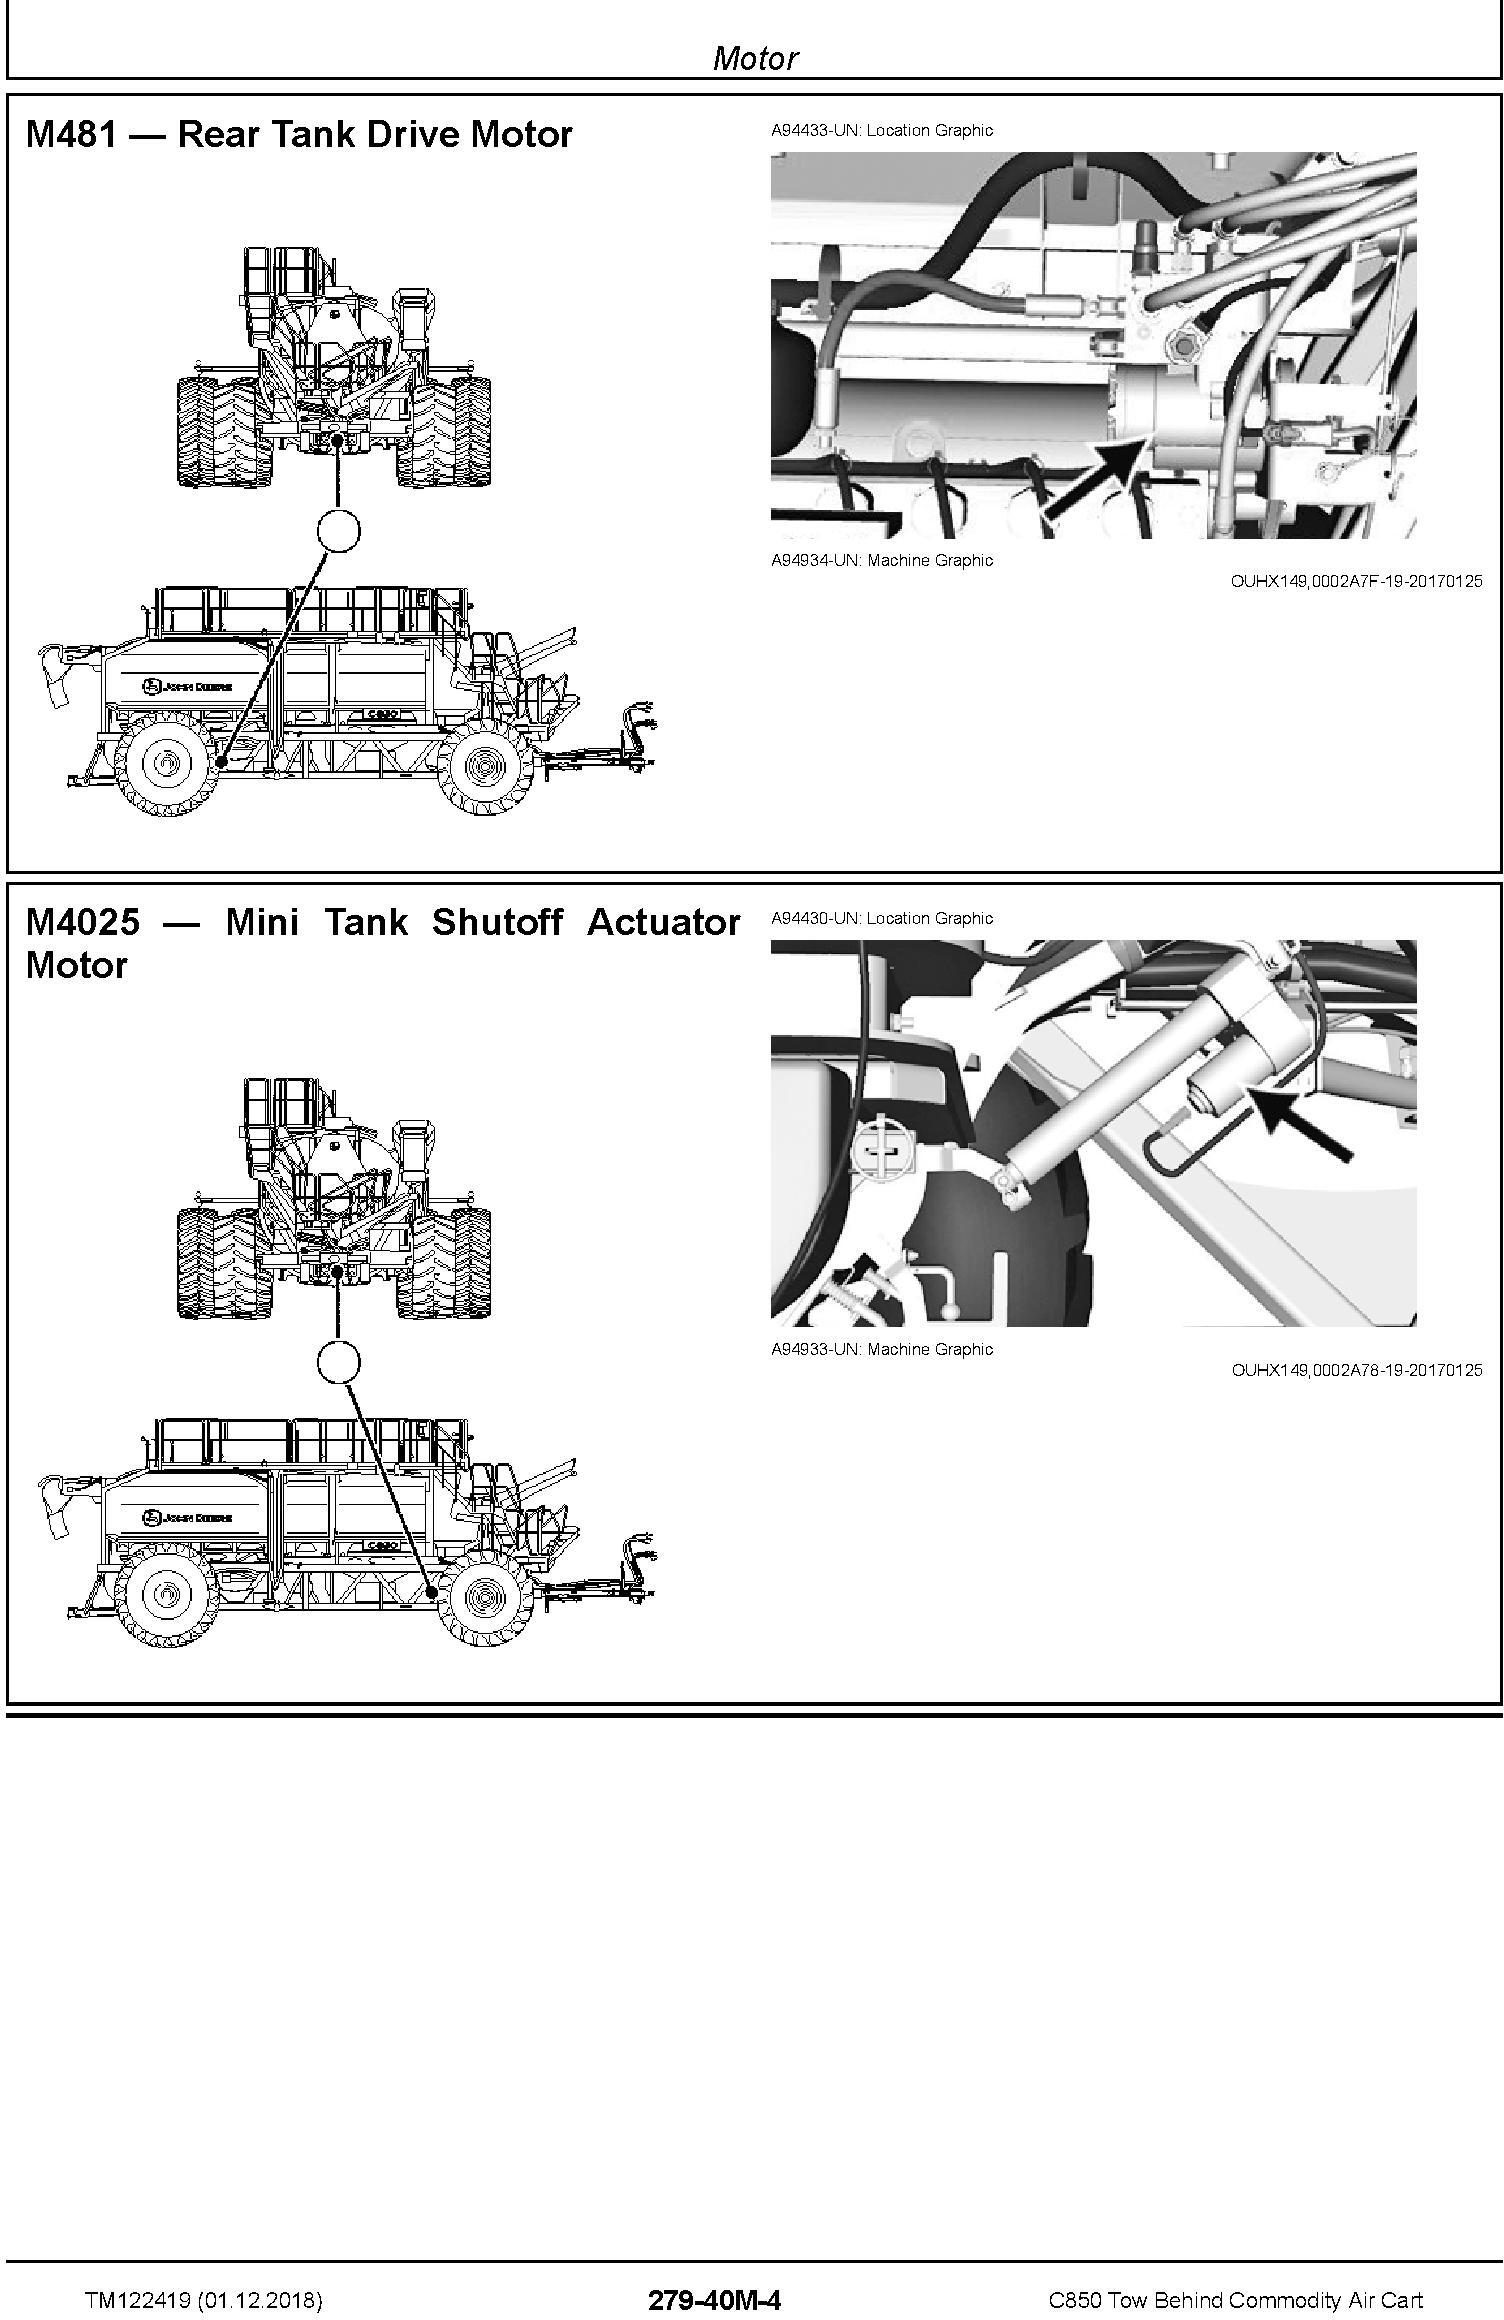 John Deere C850 Tow Behind Commodity Air Cart Diagnostic Technical Manual (TM122419) - 3